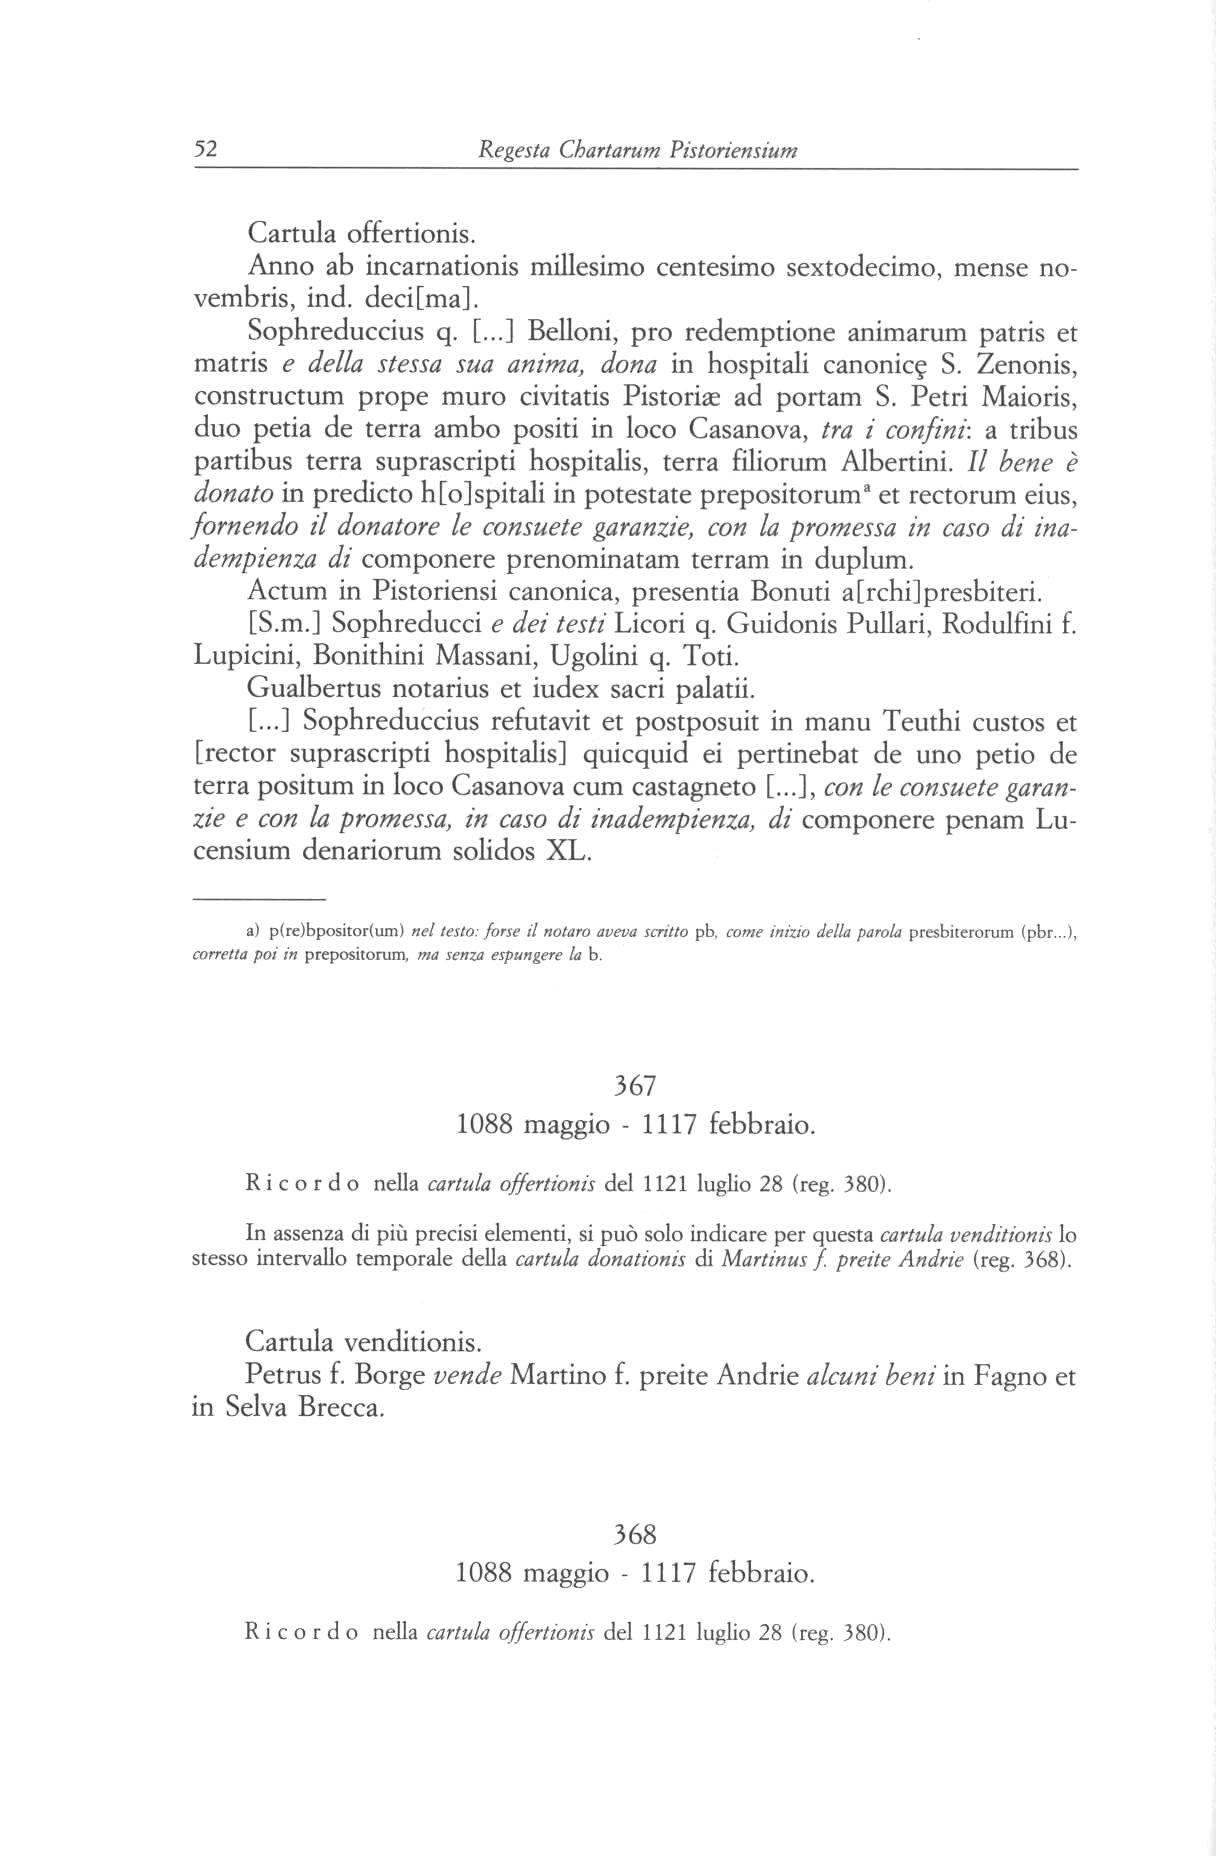 Canonica S. Zenone XII 0052.jpg